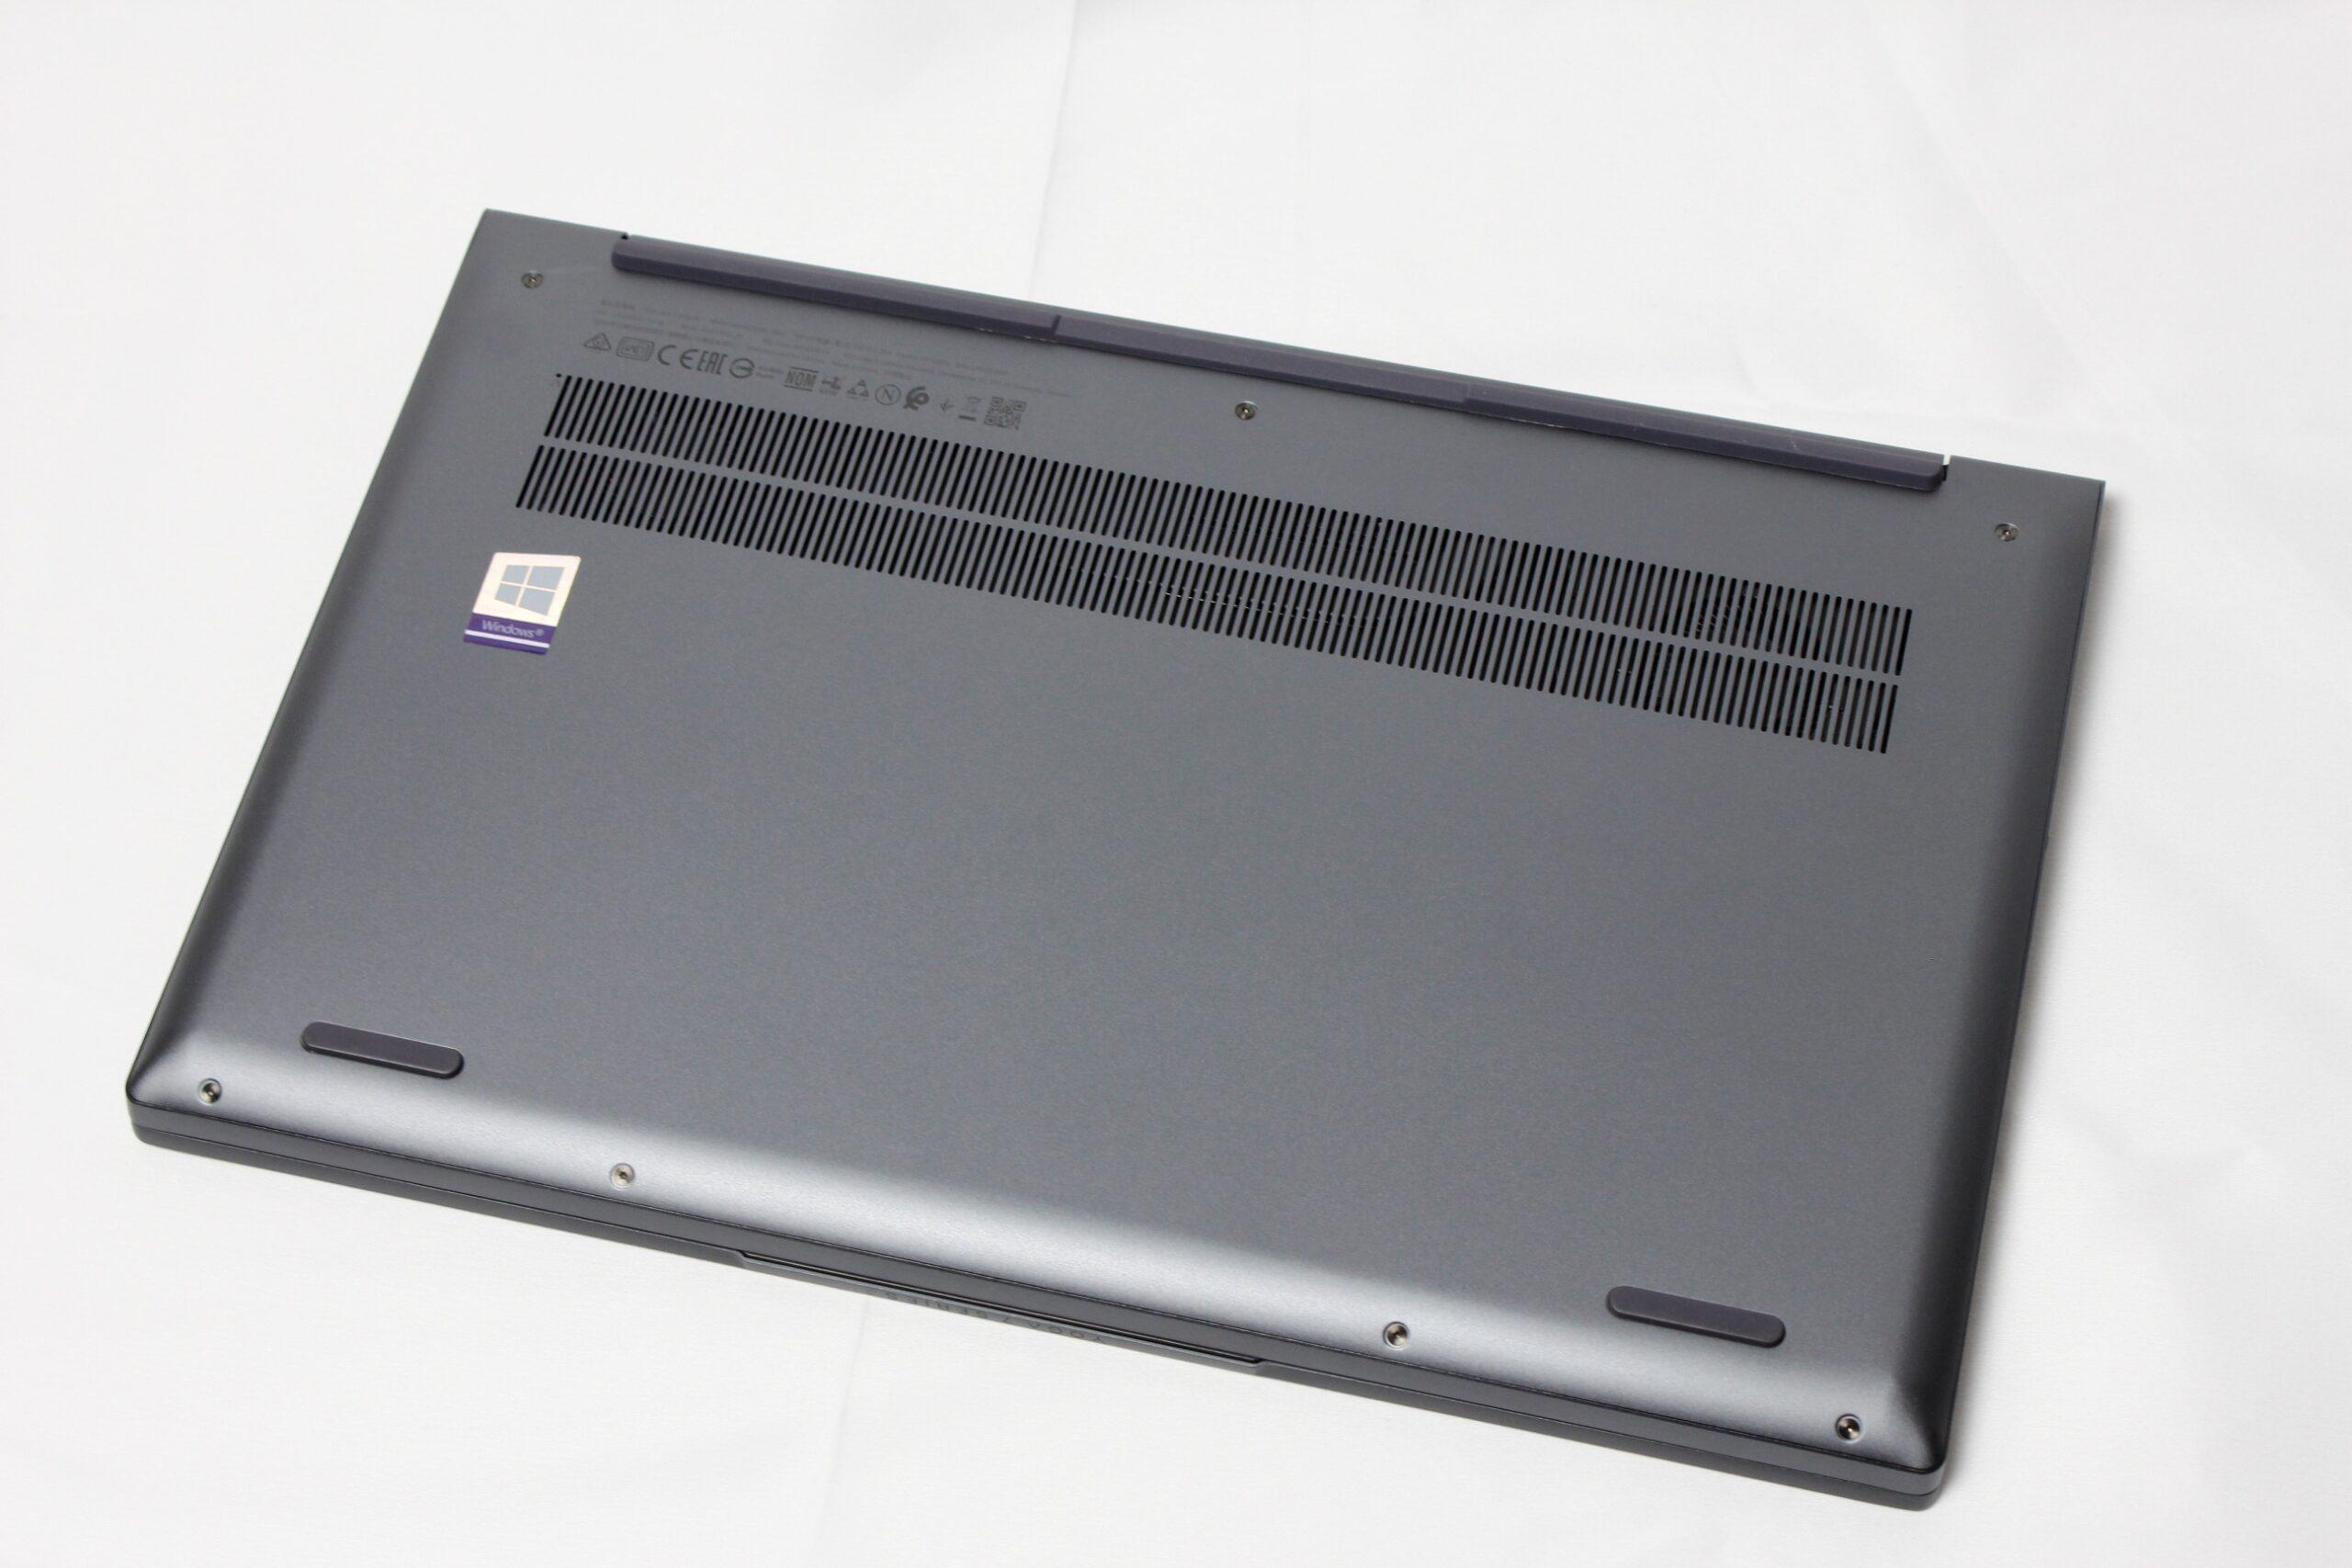 Yoga Slim 750i 14の底面の画像